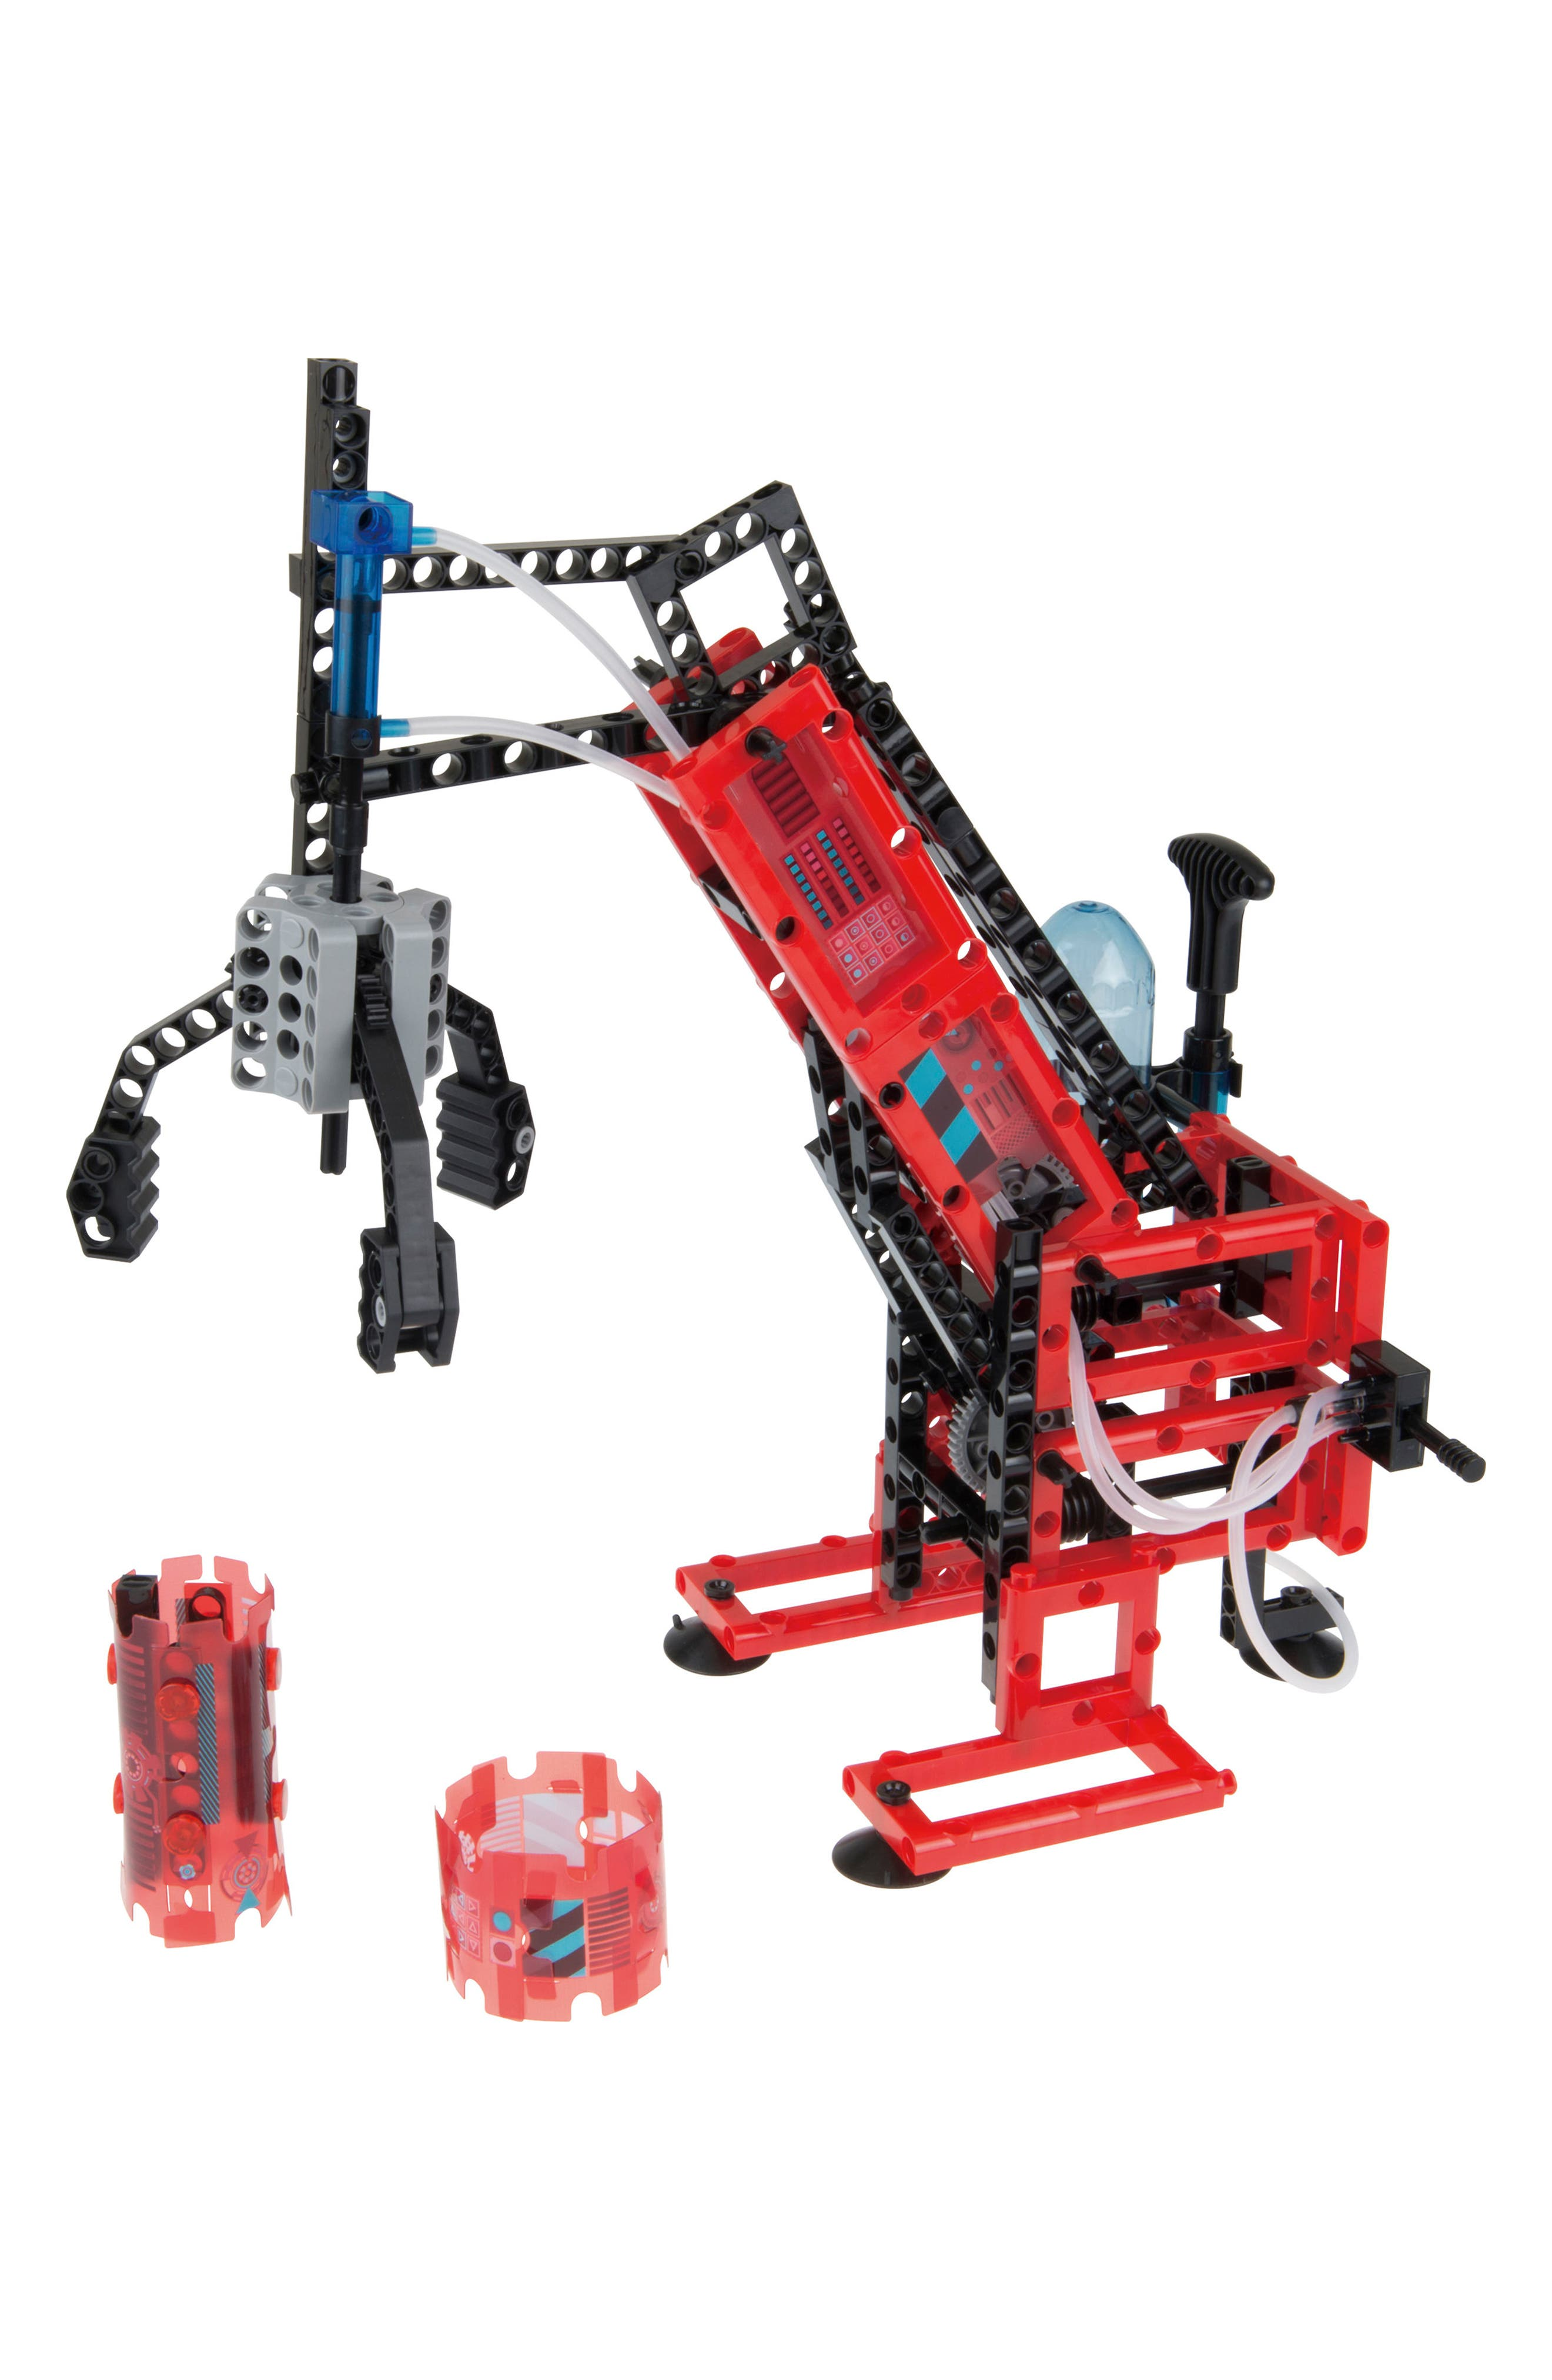 Mechanical Engineering Robotic Arms Kit,                             Alternate thumbnail 7, color,                             MULTI